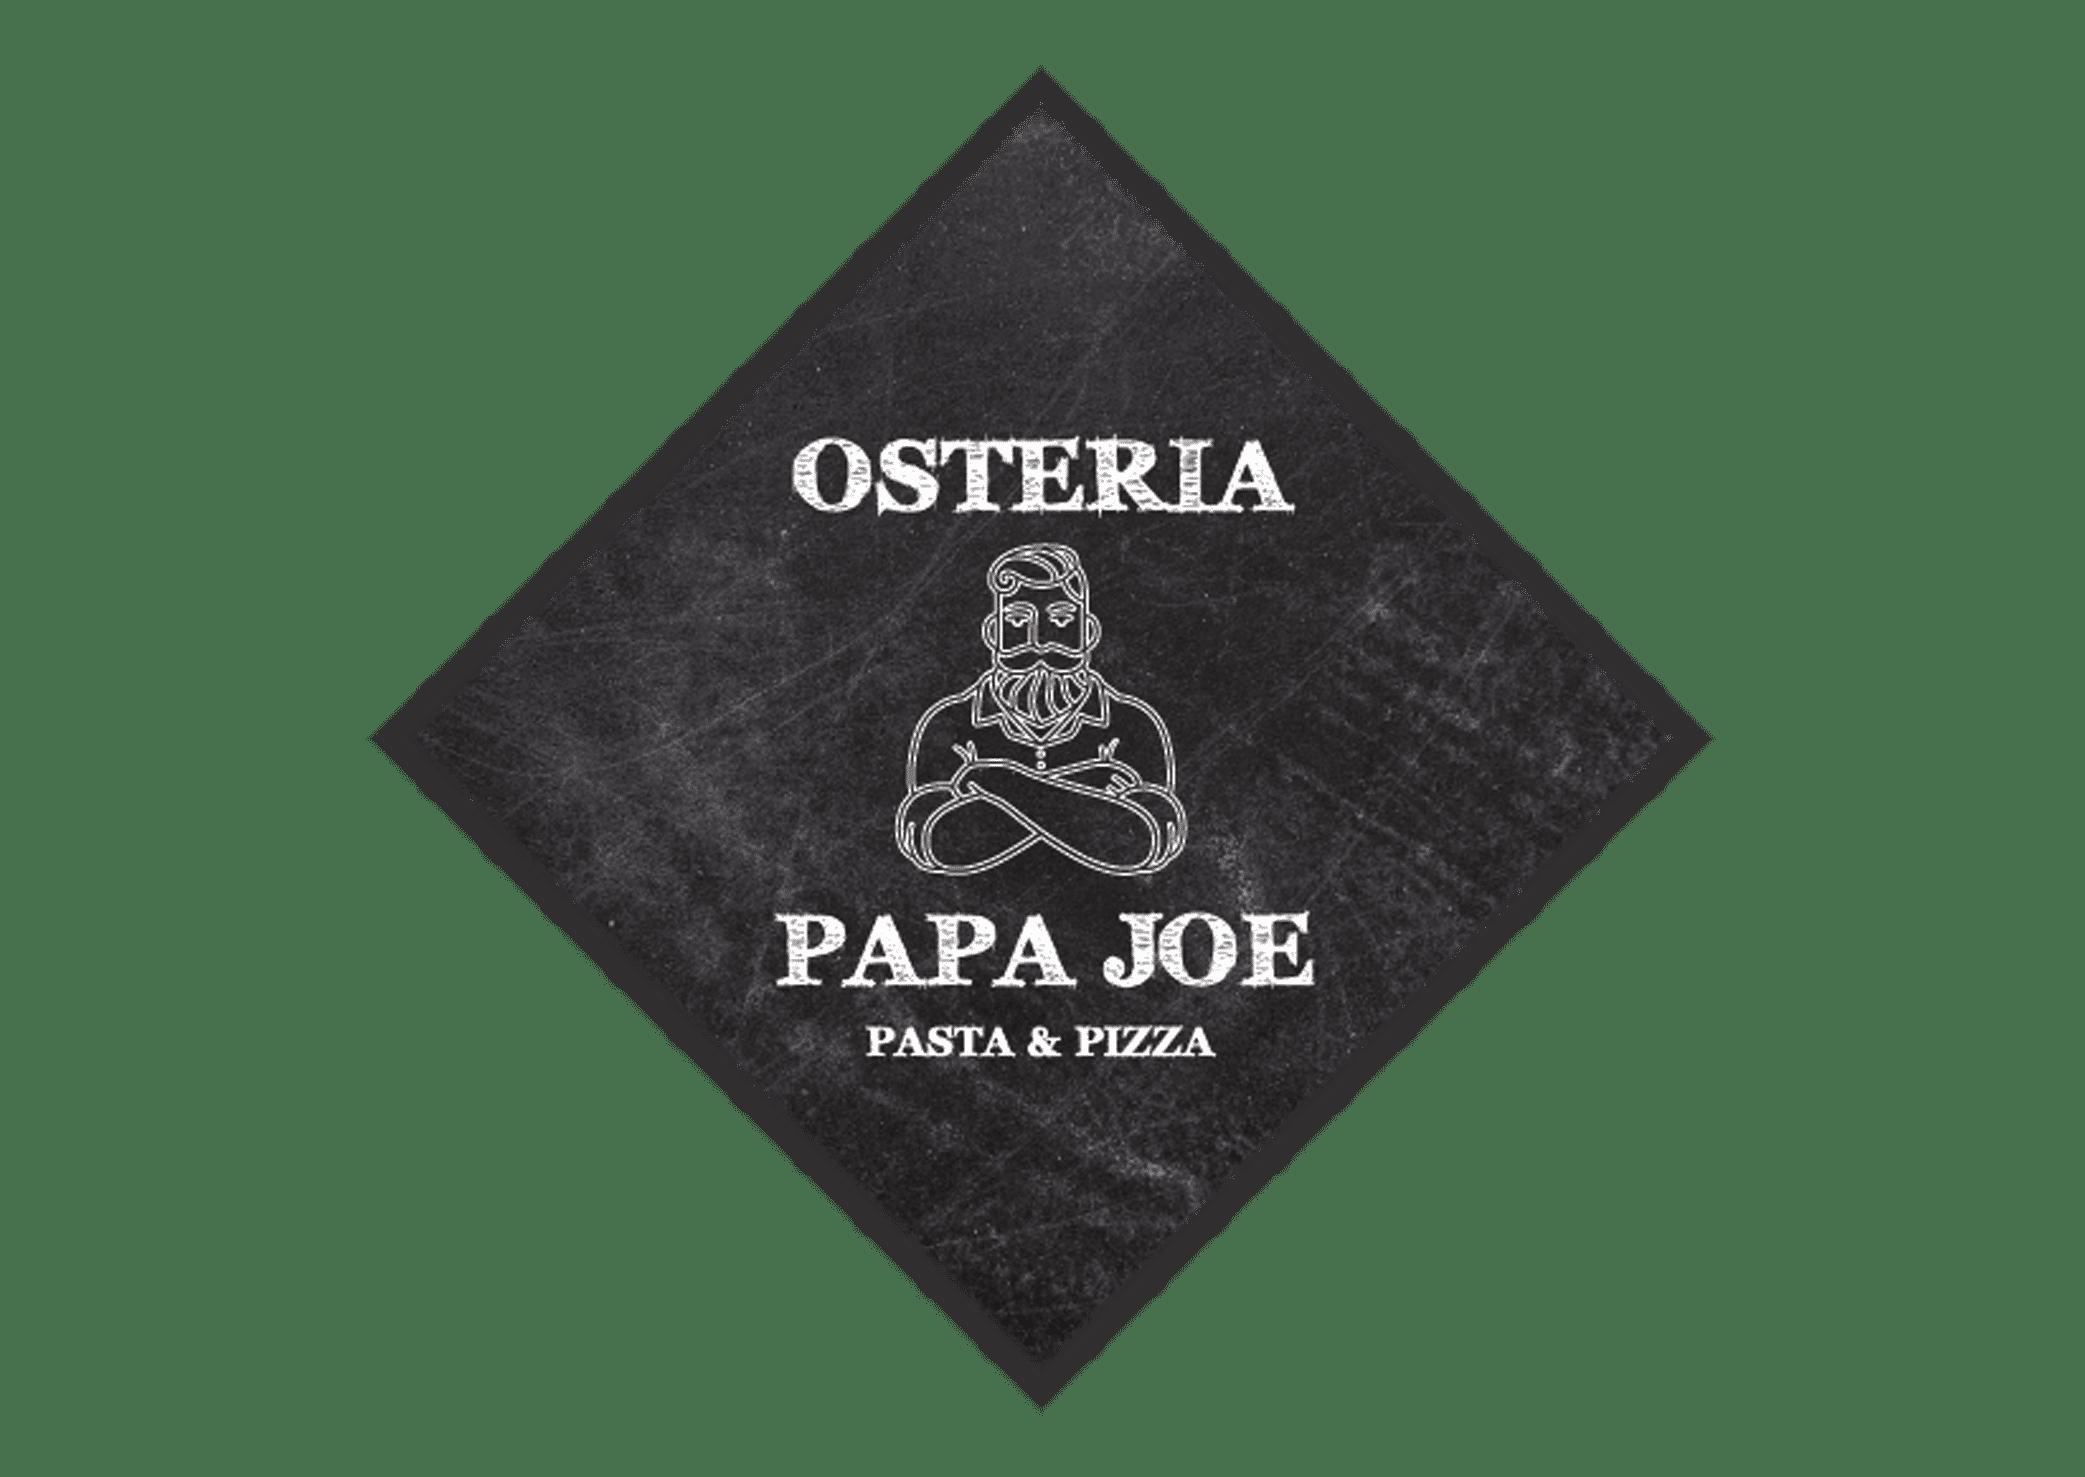 Osteria Papa Joe